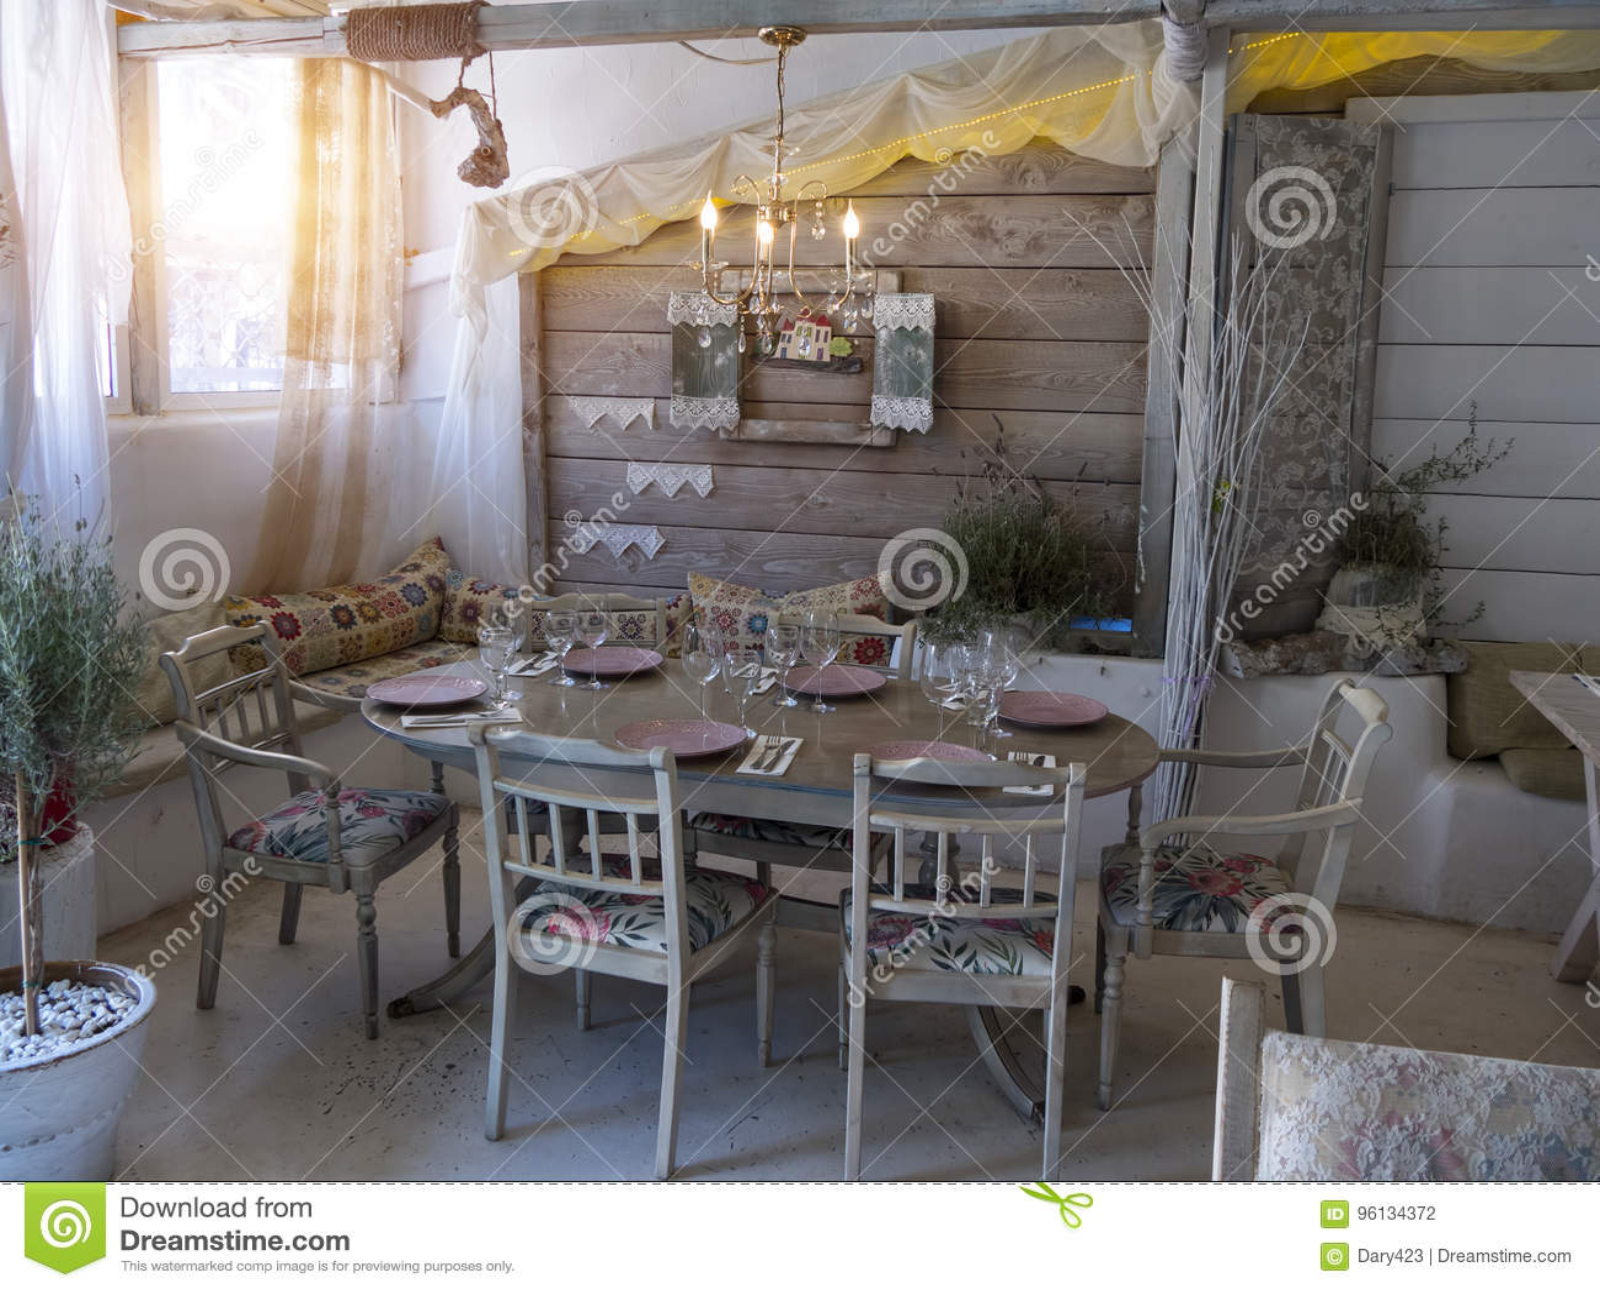 Piccola Sala Da Pranzo : Una piccola sala da pranzo in una casa rustica fotografia stock